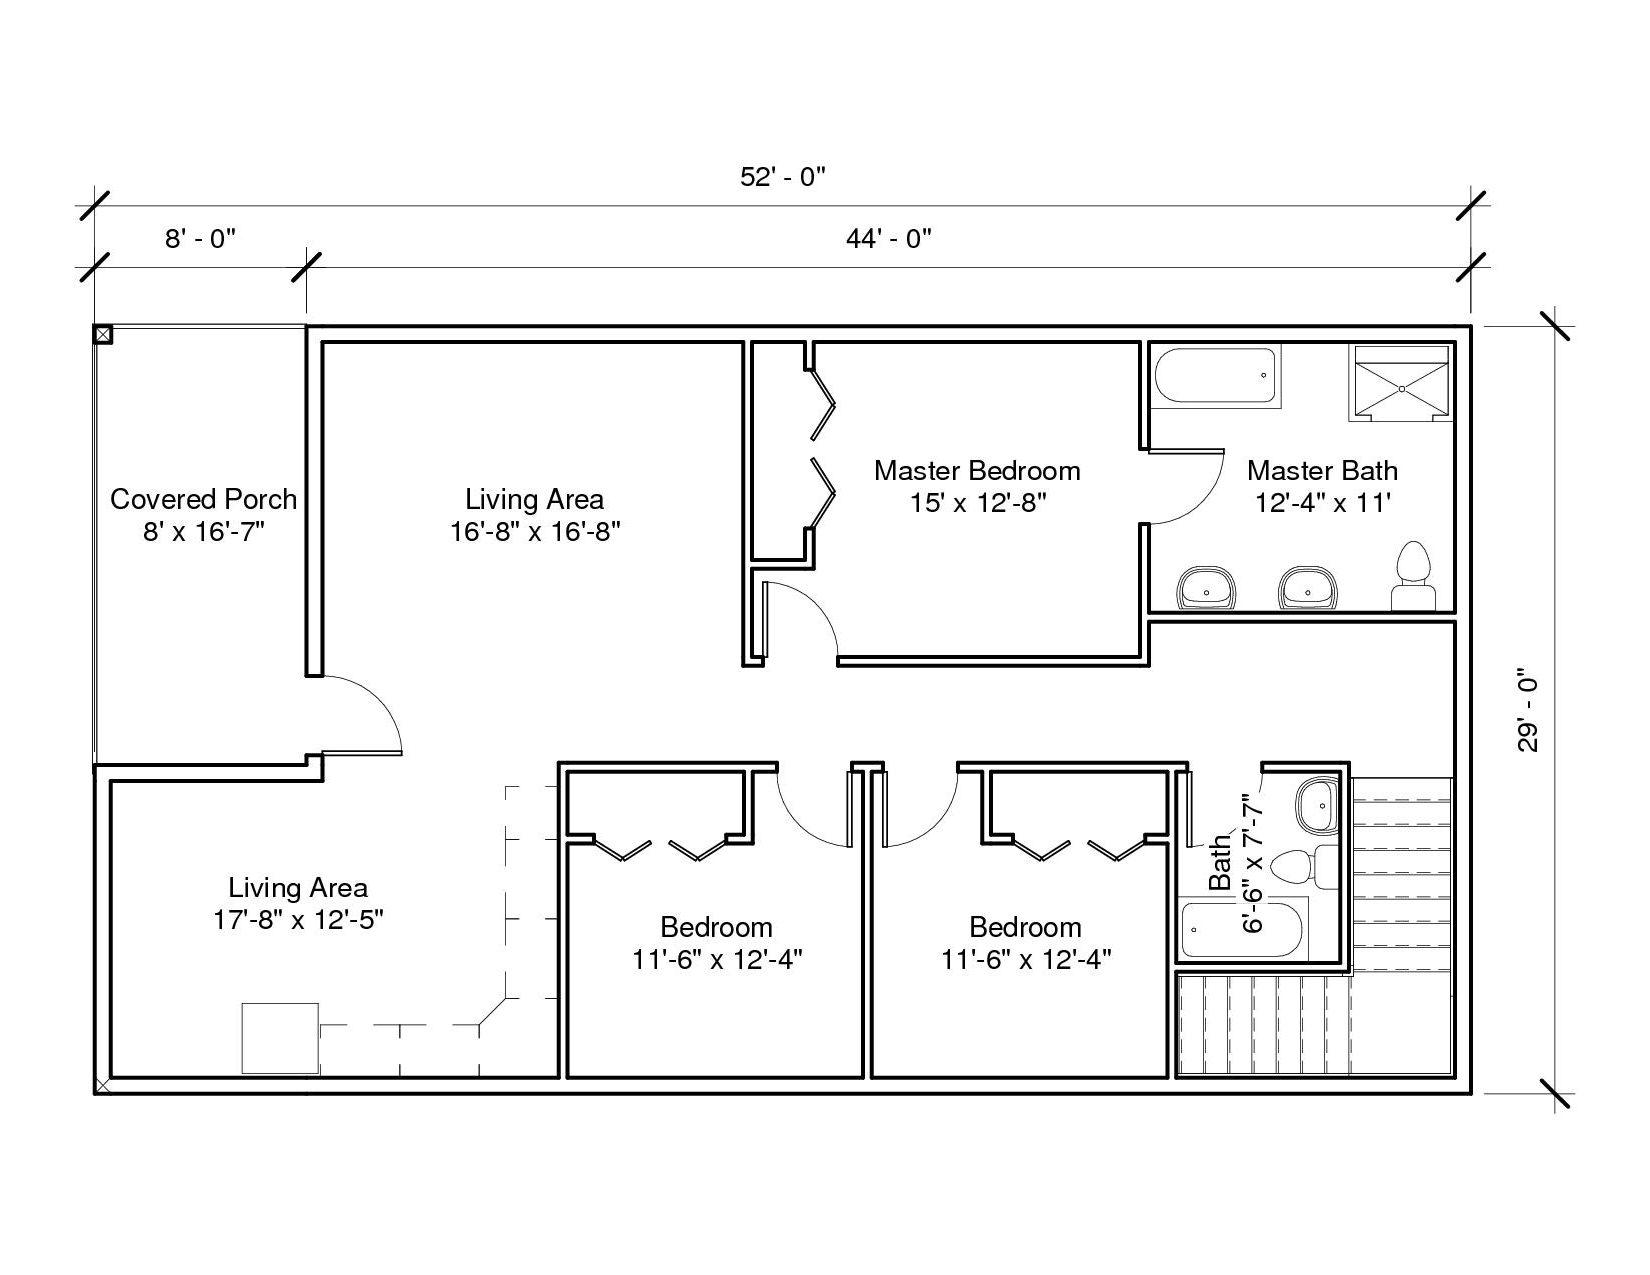 Studio Garage 2A 2nd Floor Plan